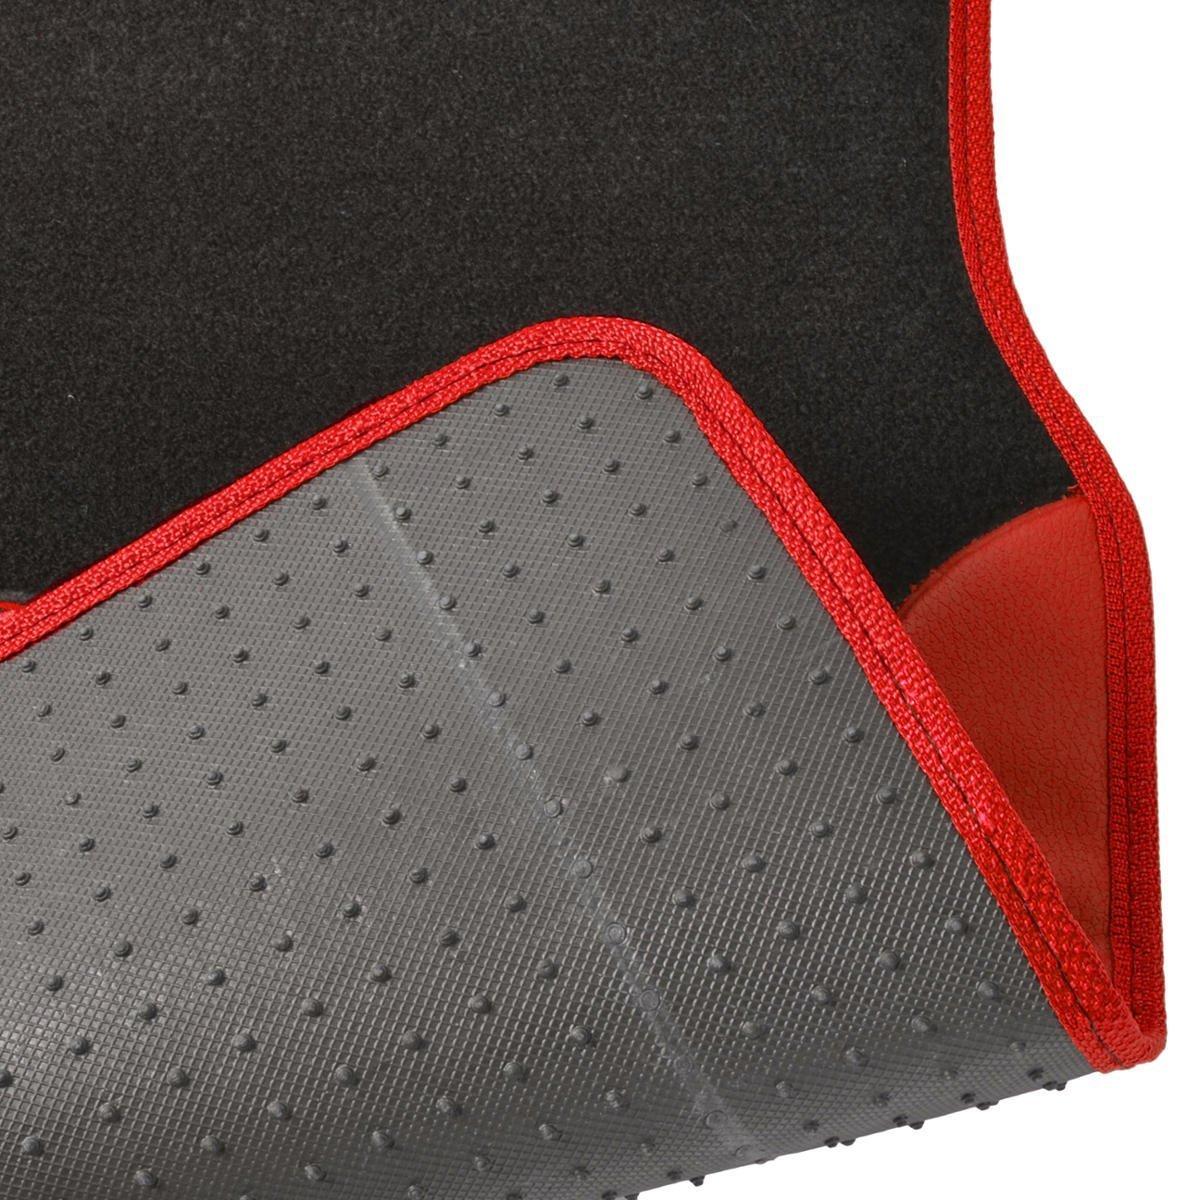 Blue A Set of 4 Universal Fit Plush Carpet with Vinyl Trim Floor Mats For Cars//Trucks